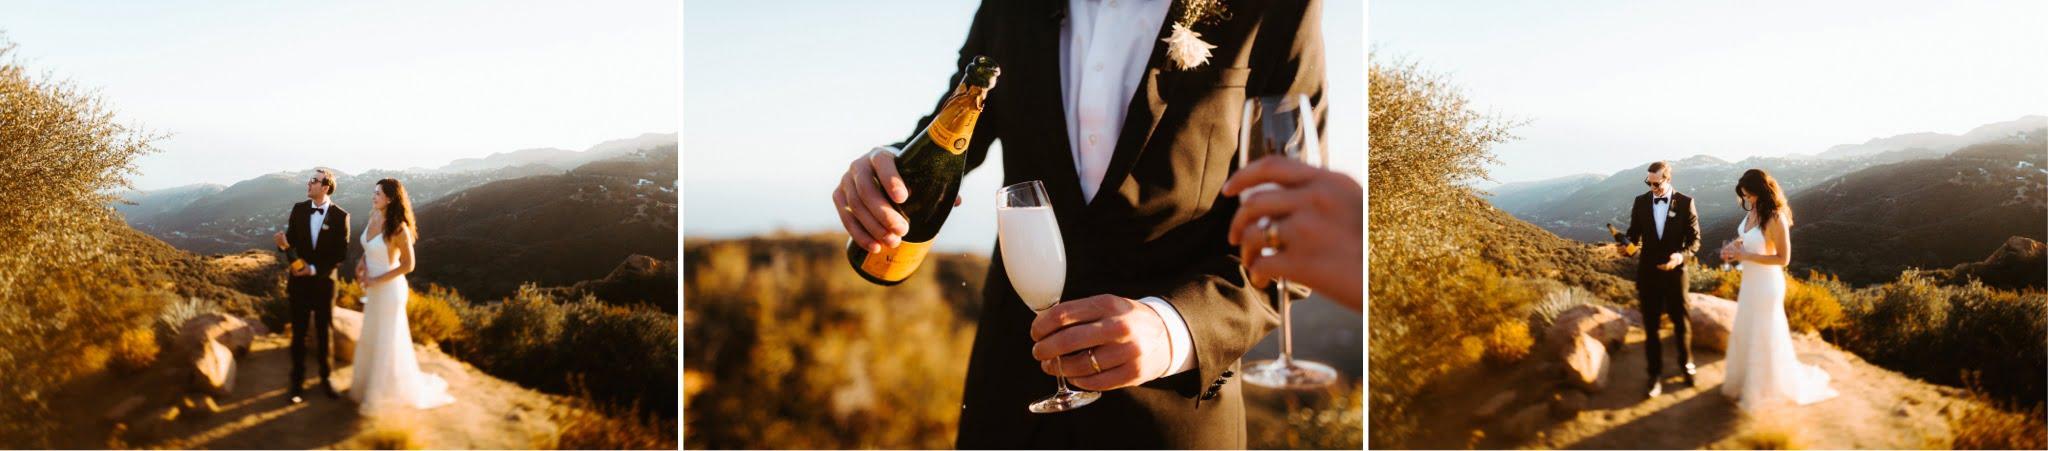 malibu wedding 086 1